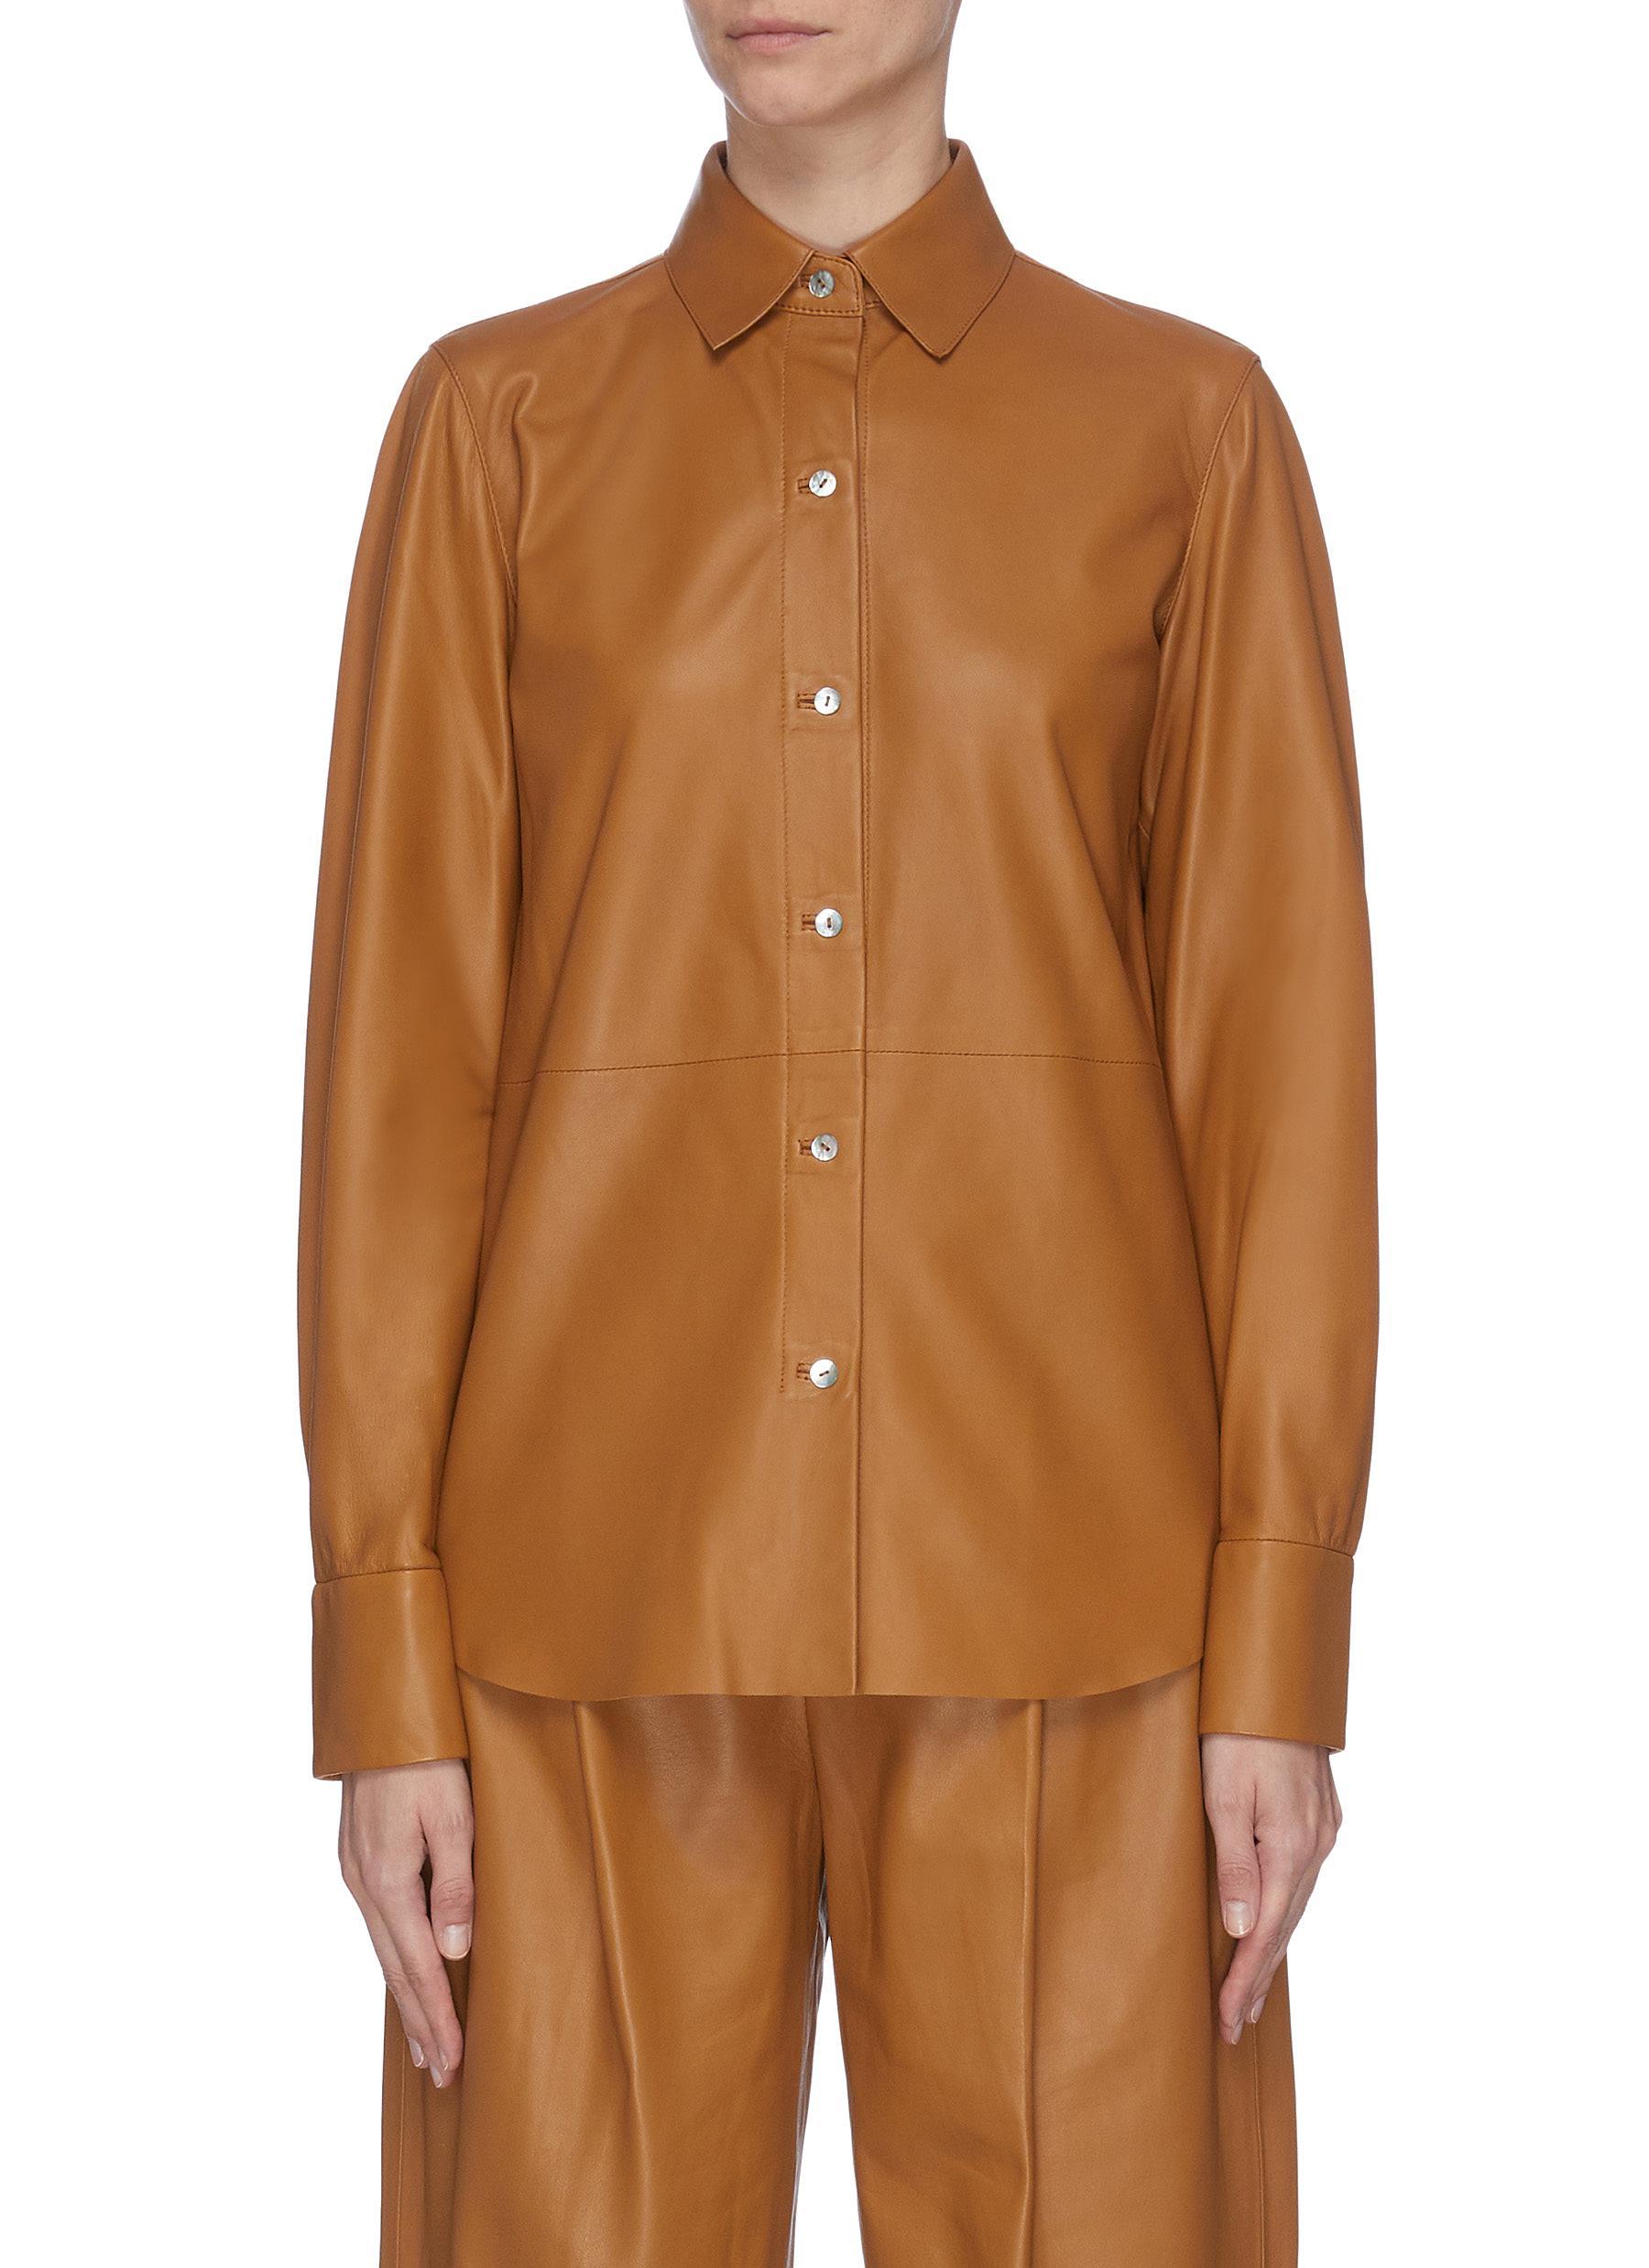 shop Vince Lambskin leather shirt online